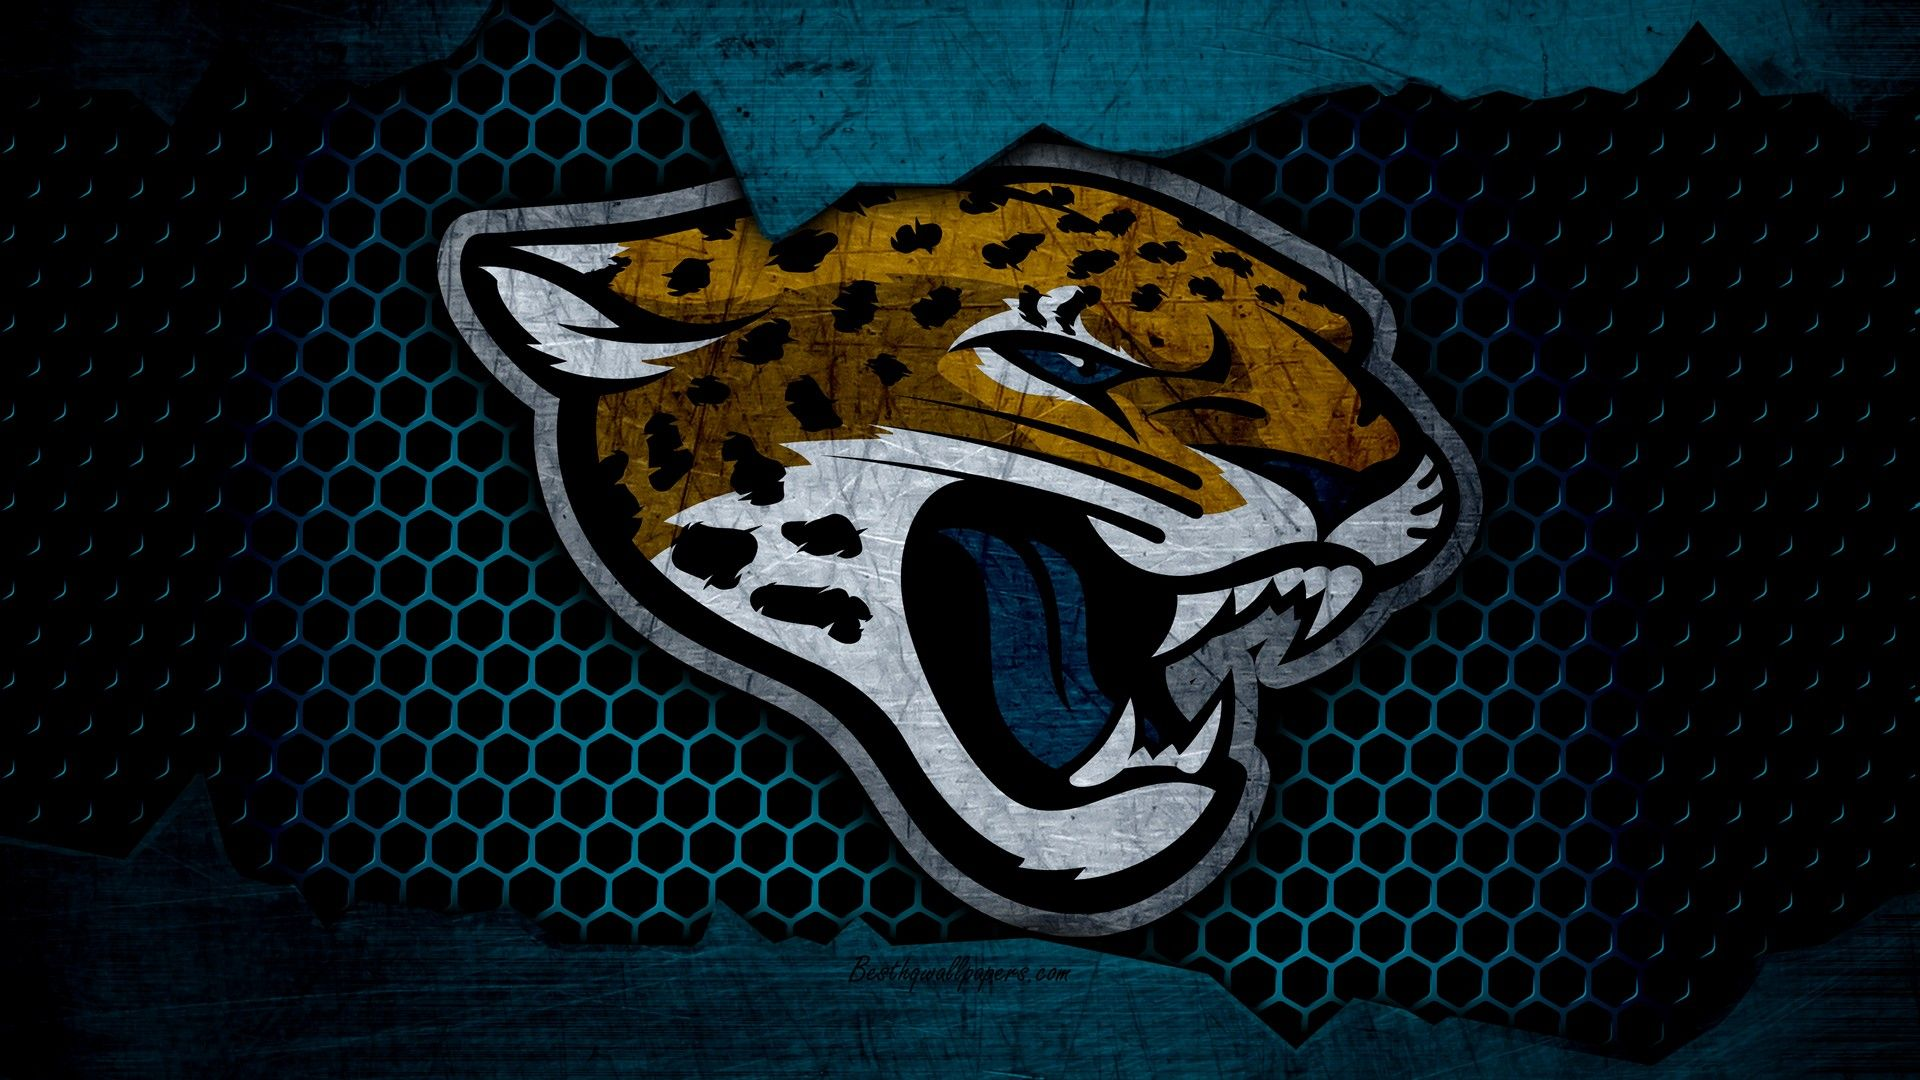 Jacksonville Jaguars Wallpaper Hd 2021 Nfl Football Wallpapers Jacksonville Jaguars Nfl Football Wallpaper American Football